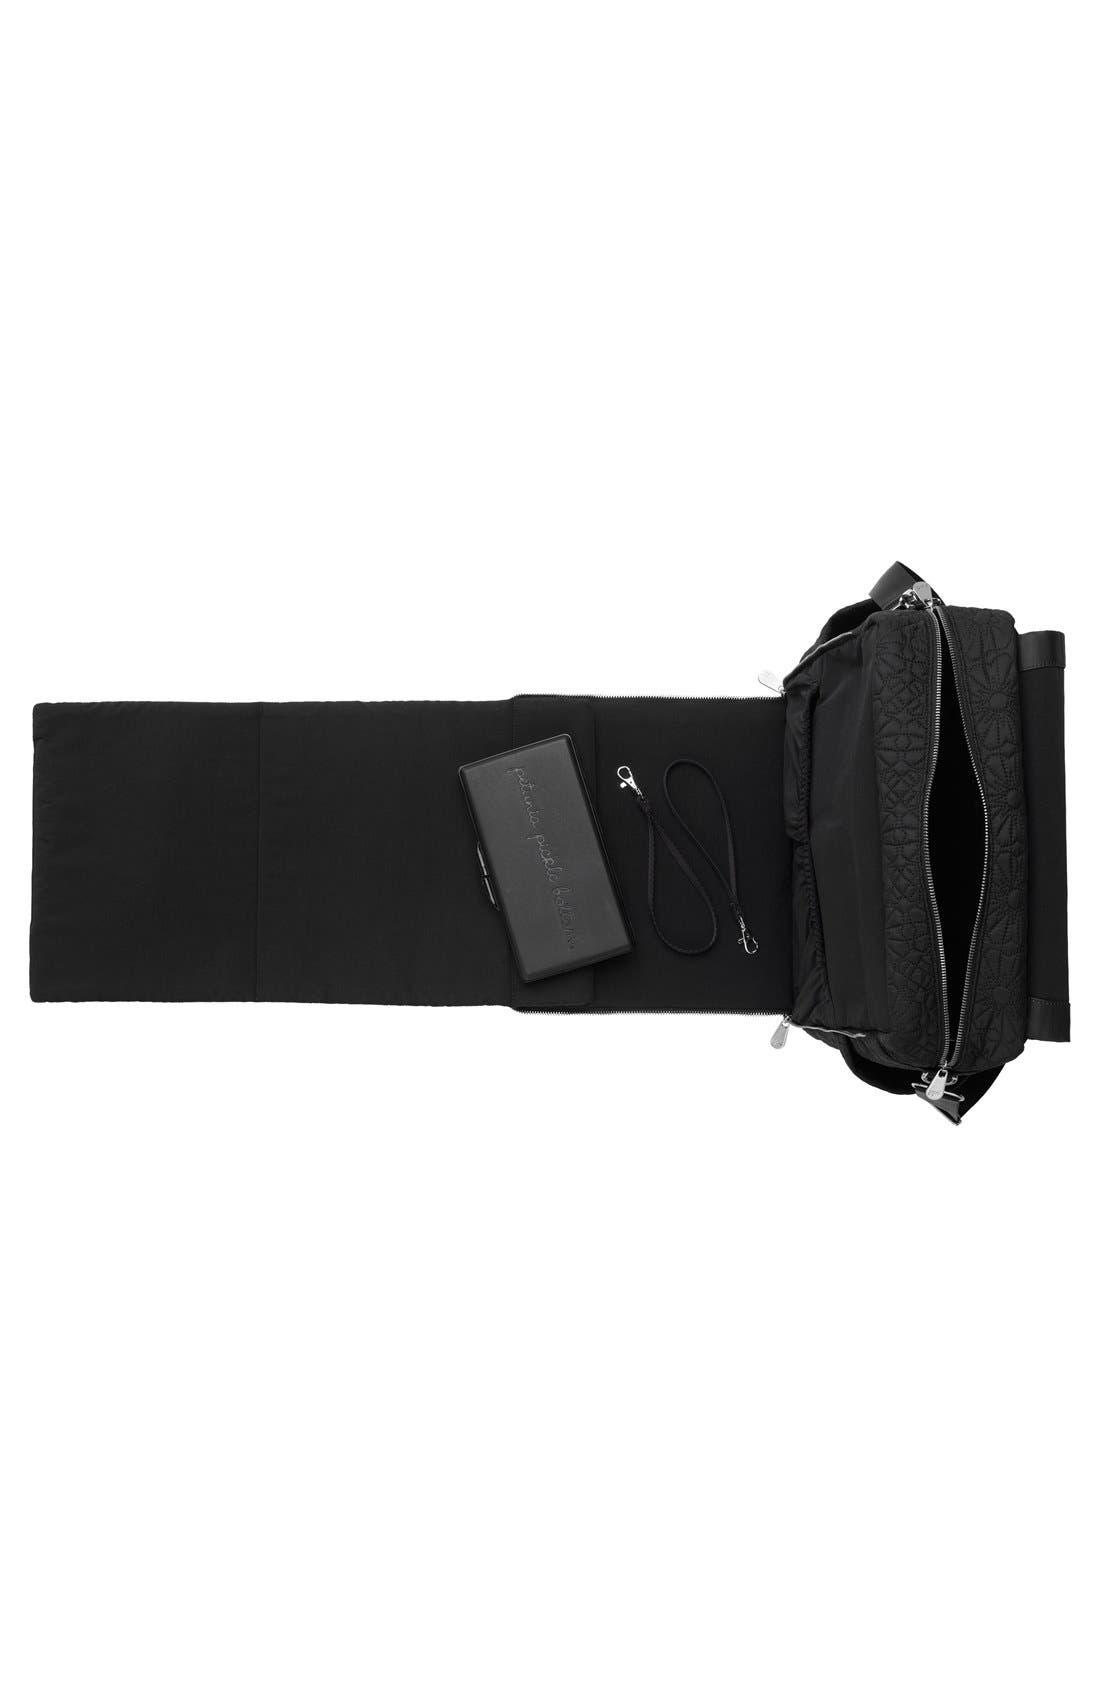 'Embossed Boxy' Backpack Diaper Bag,                             Alternate thumbnail 5, color,                             002